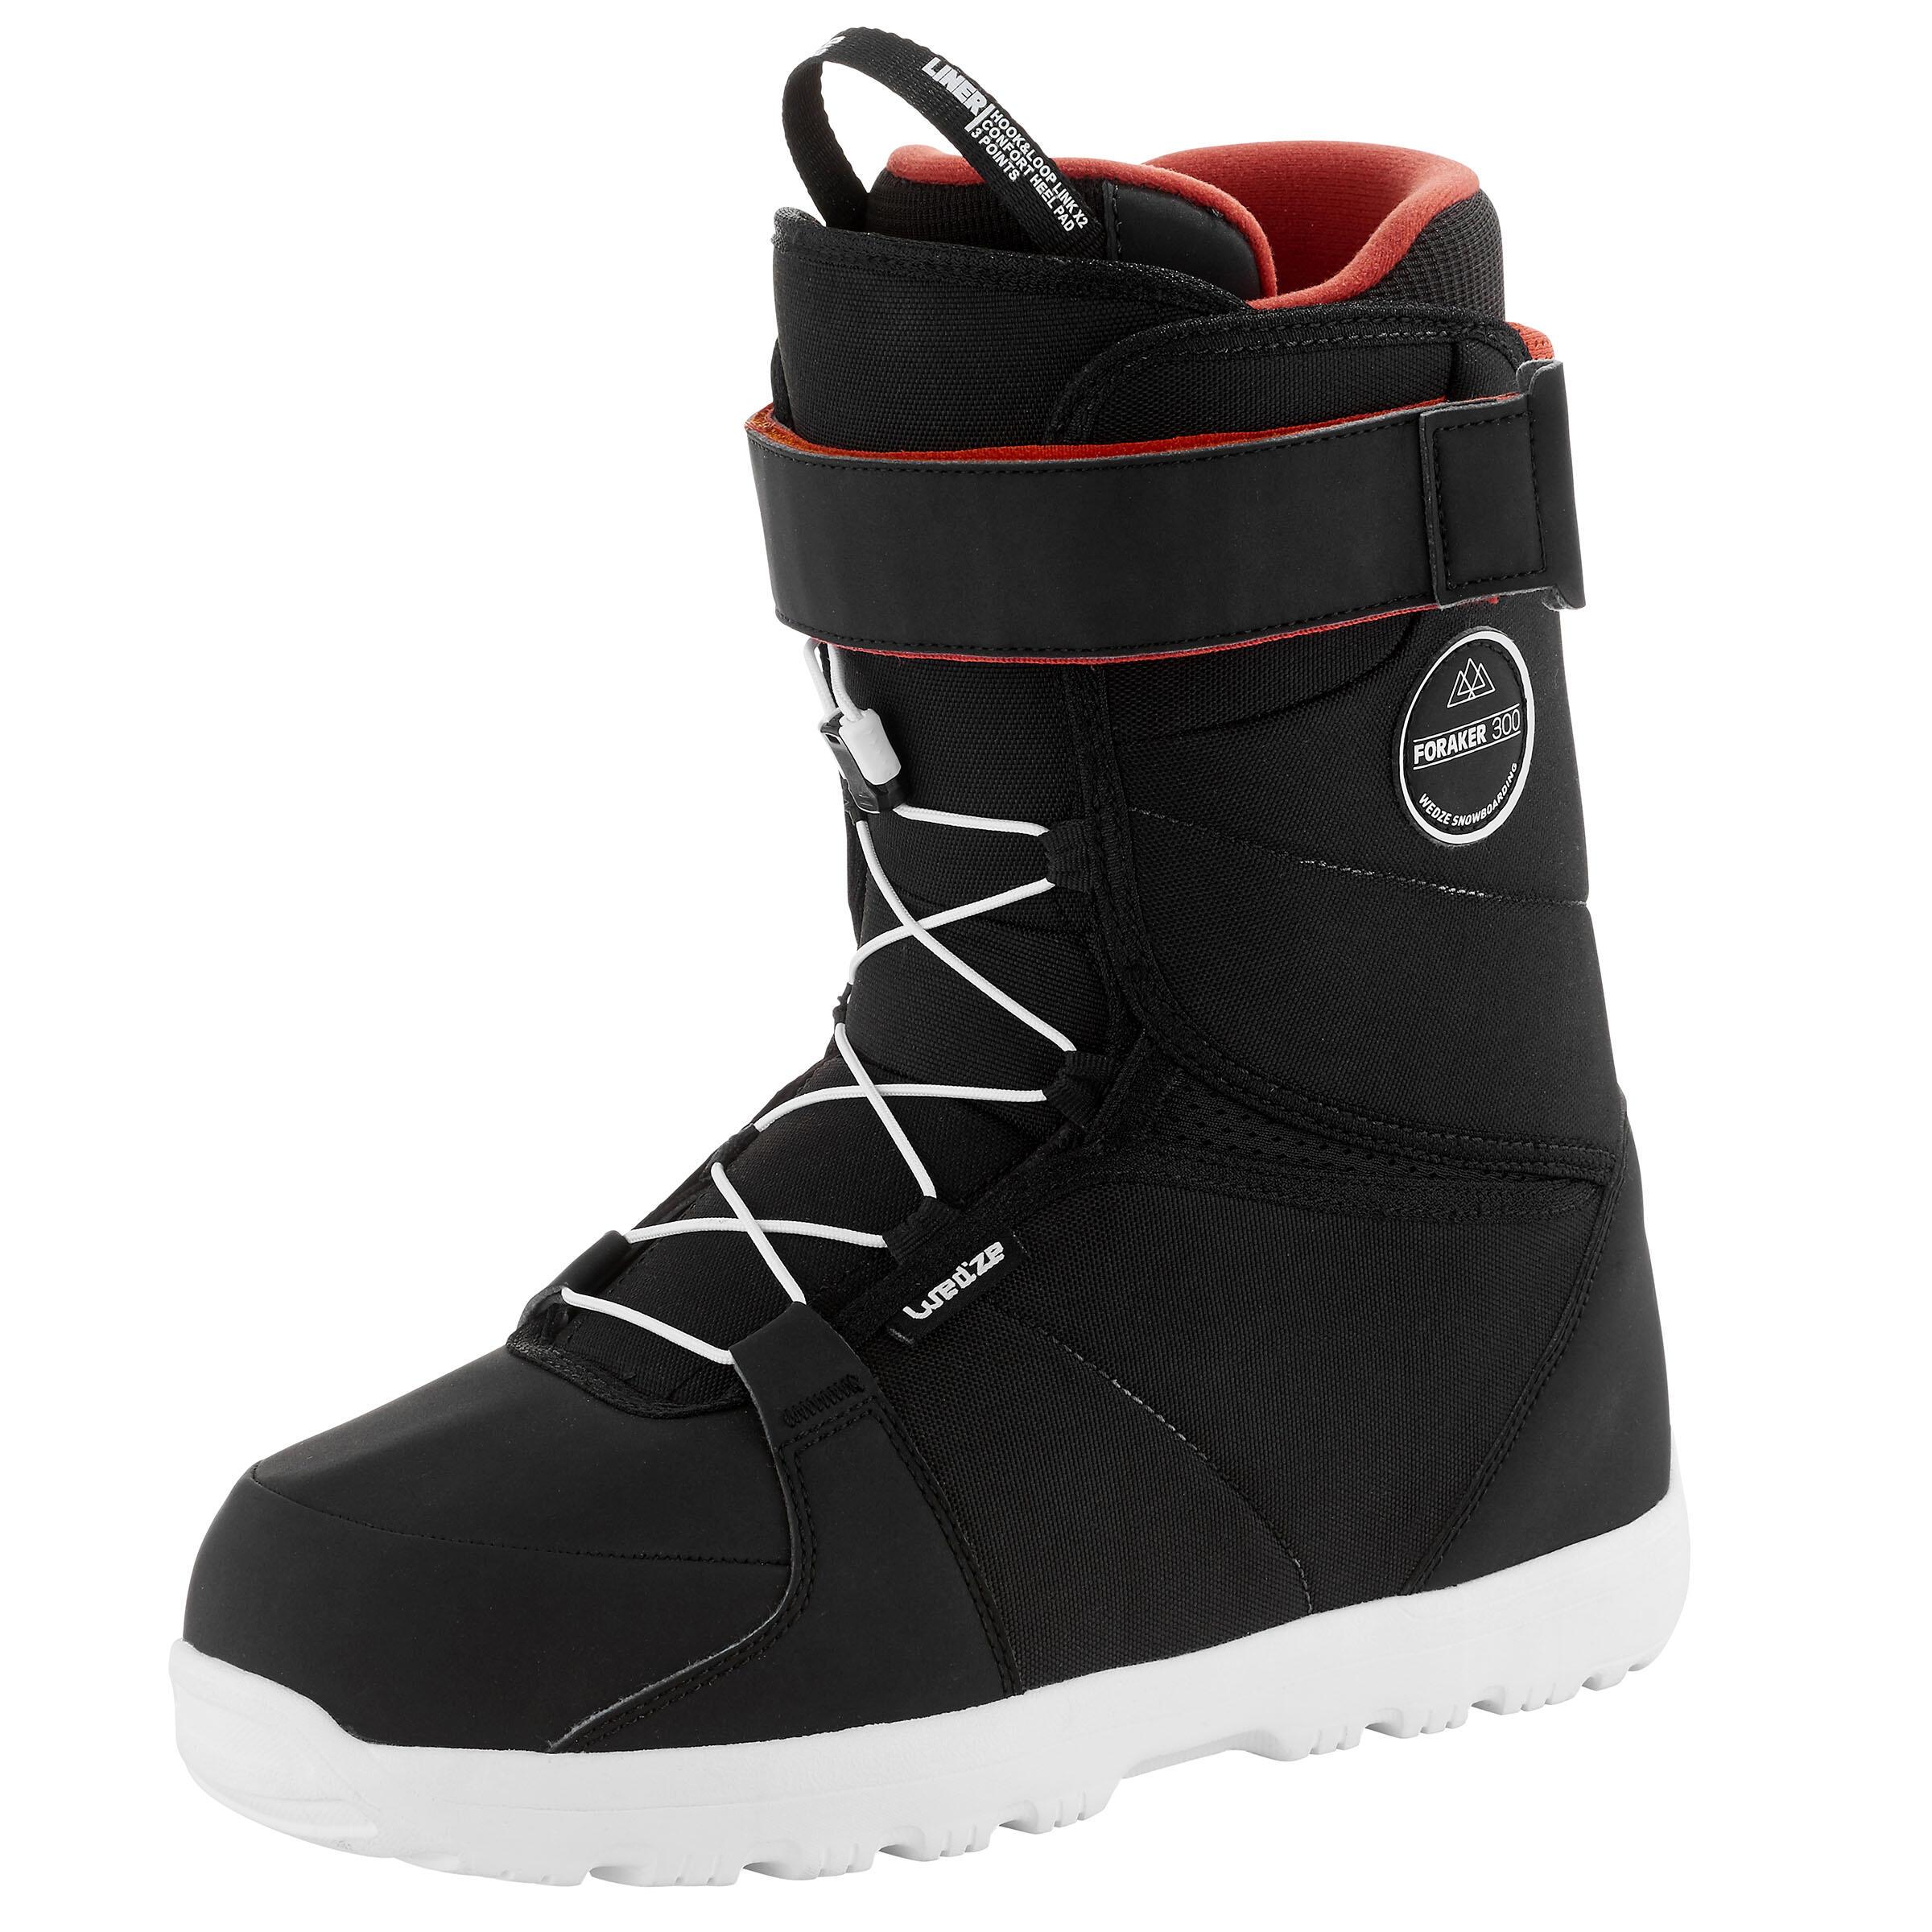 Chaussures de snowboard homme polyvalente foraker 300 noir wedze